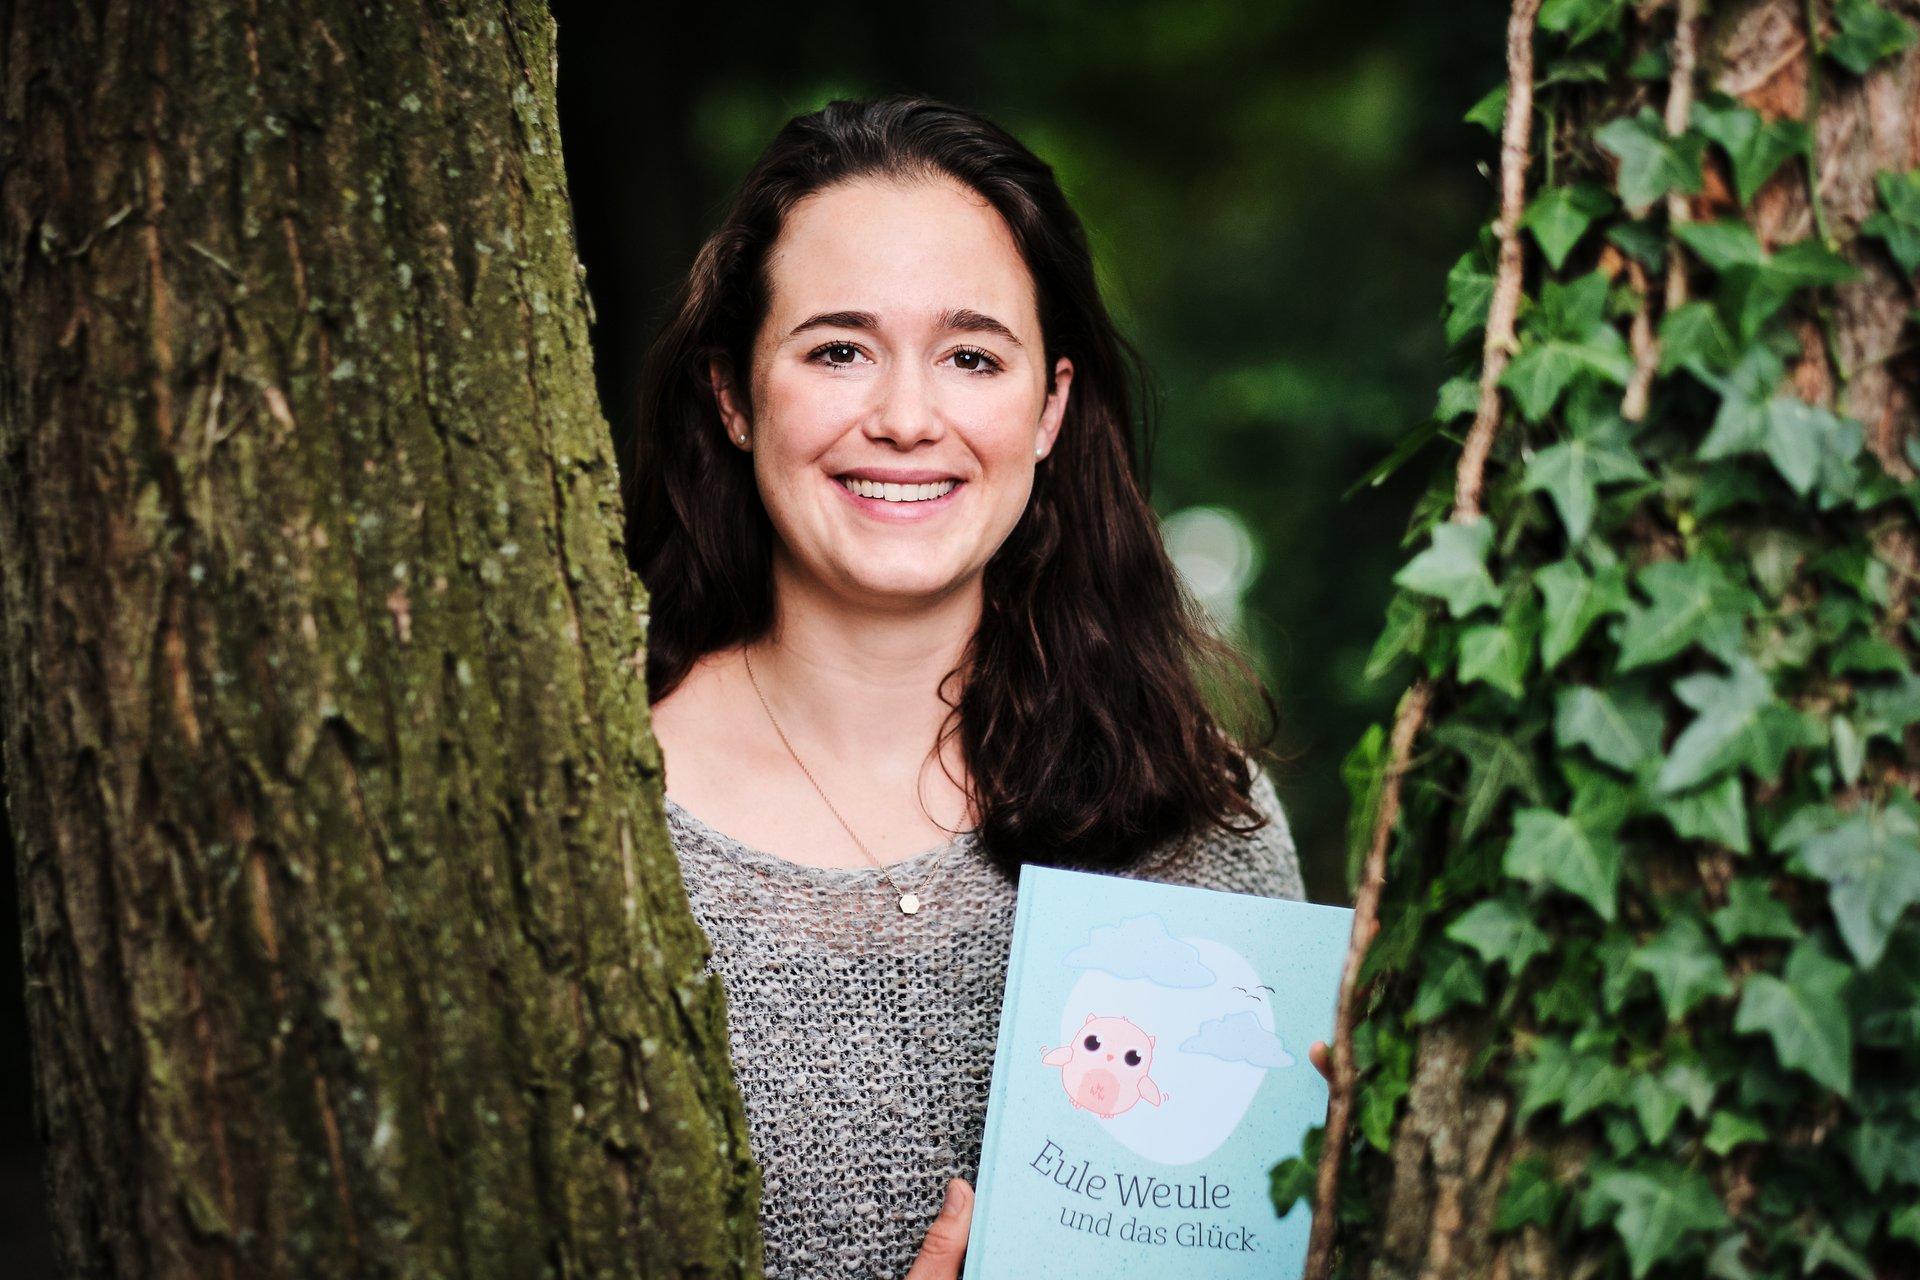 Friederike Zoubaa präsentiert ihr erstes Kinderbuch